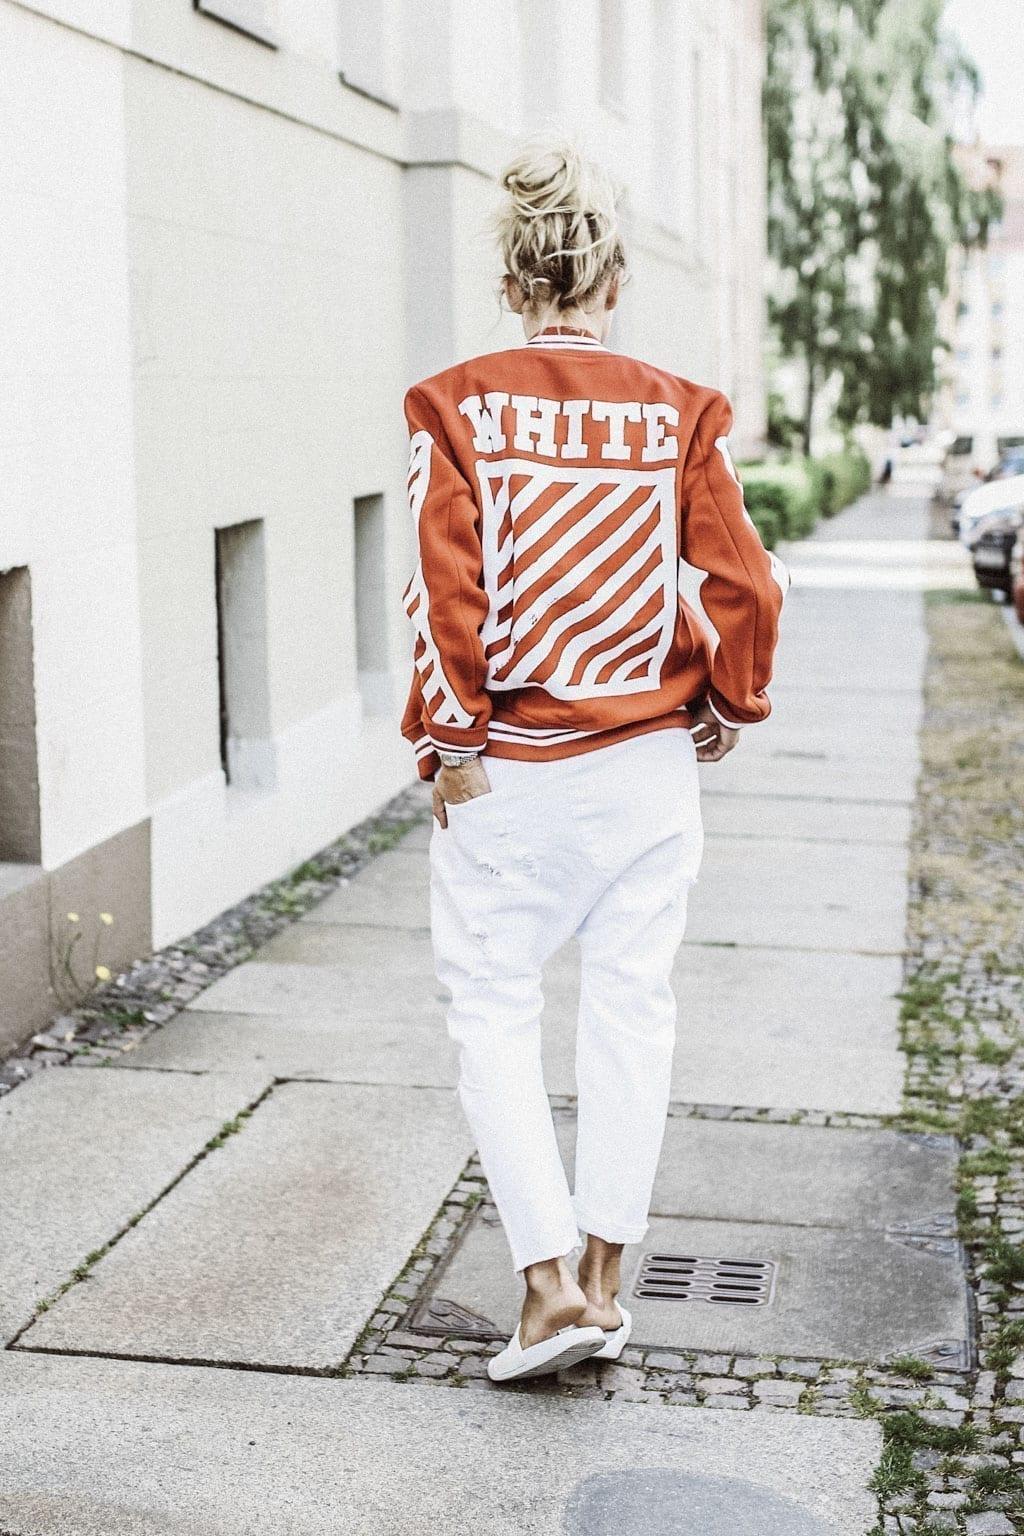 Constantly-K-karin-kaswurm-white-red-rieger-jacket-salzburg-fashion-street-style-8368